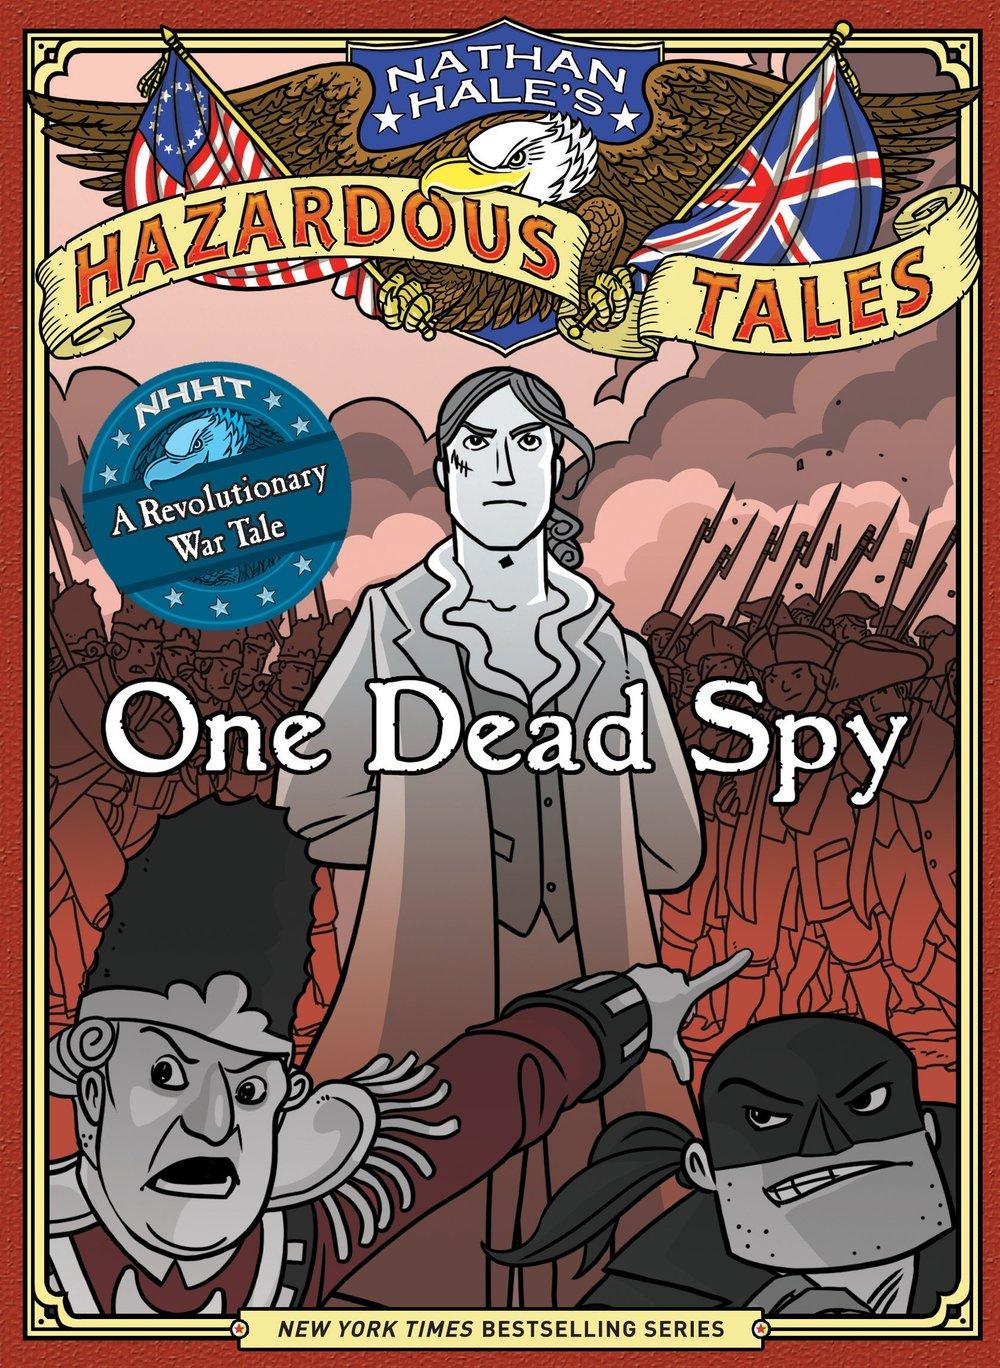 nathan-hale-one-dead-spy.jpg